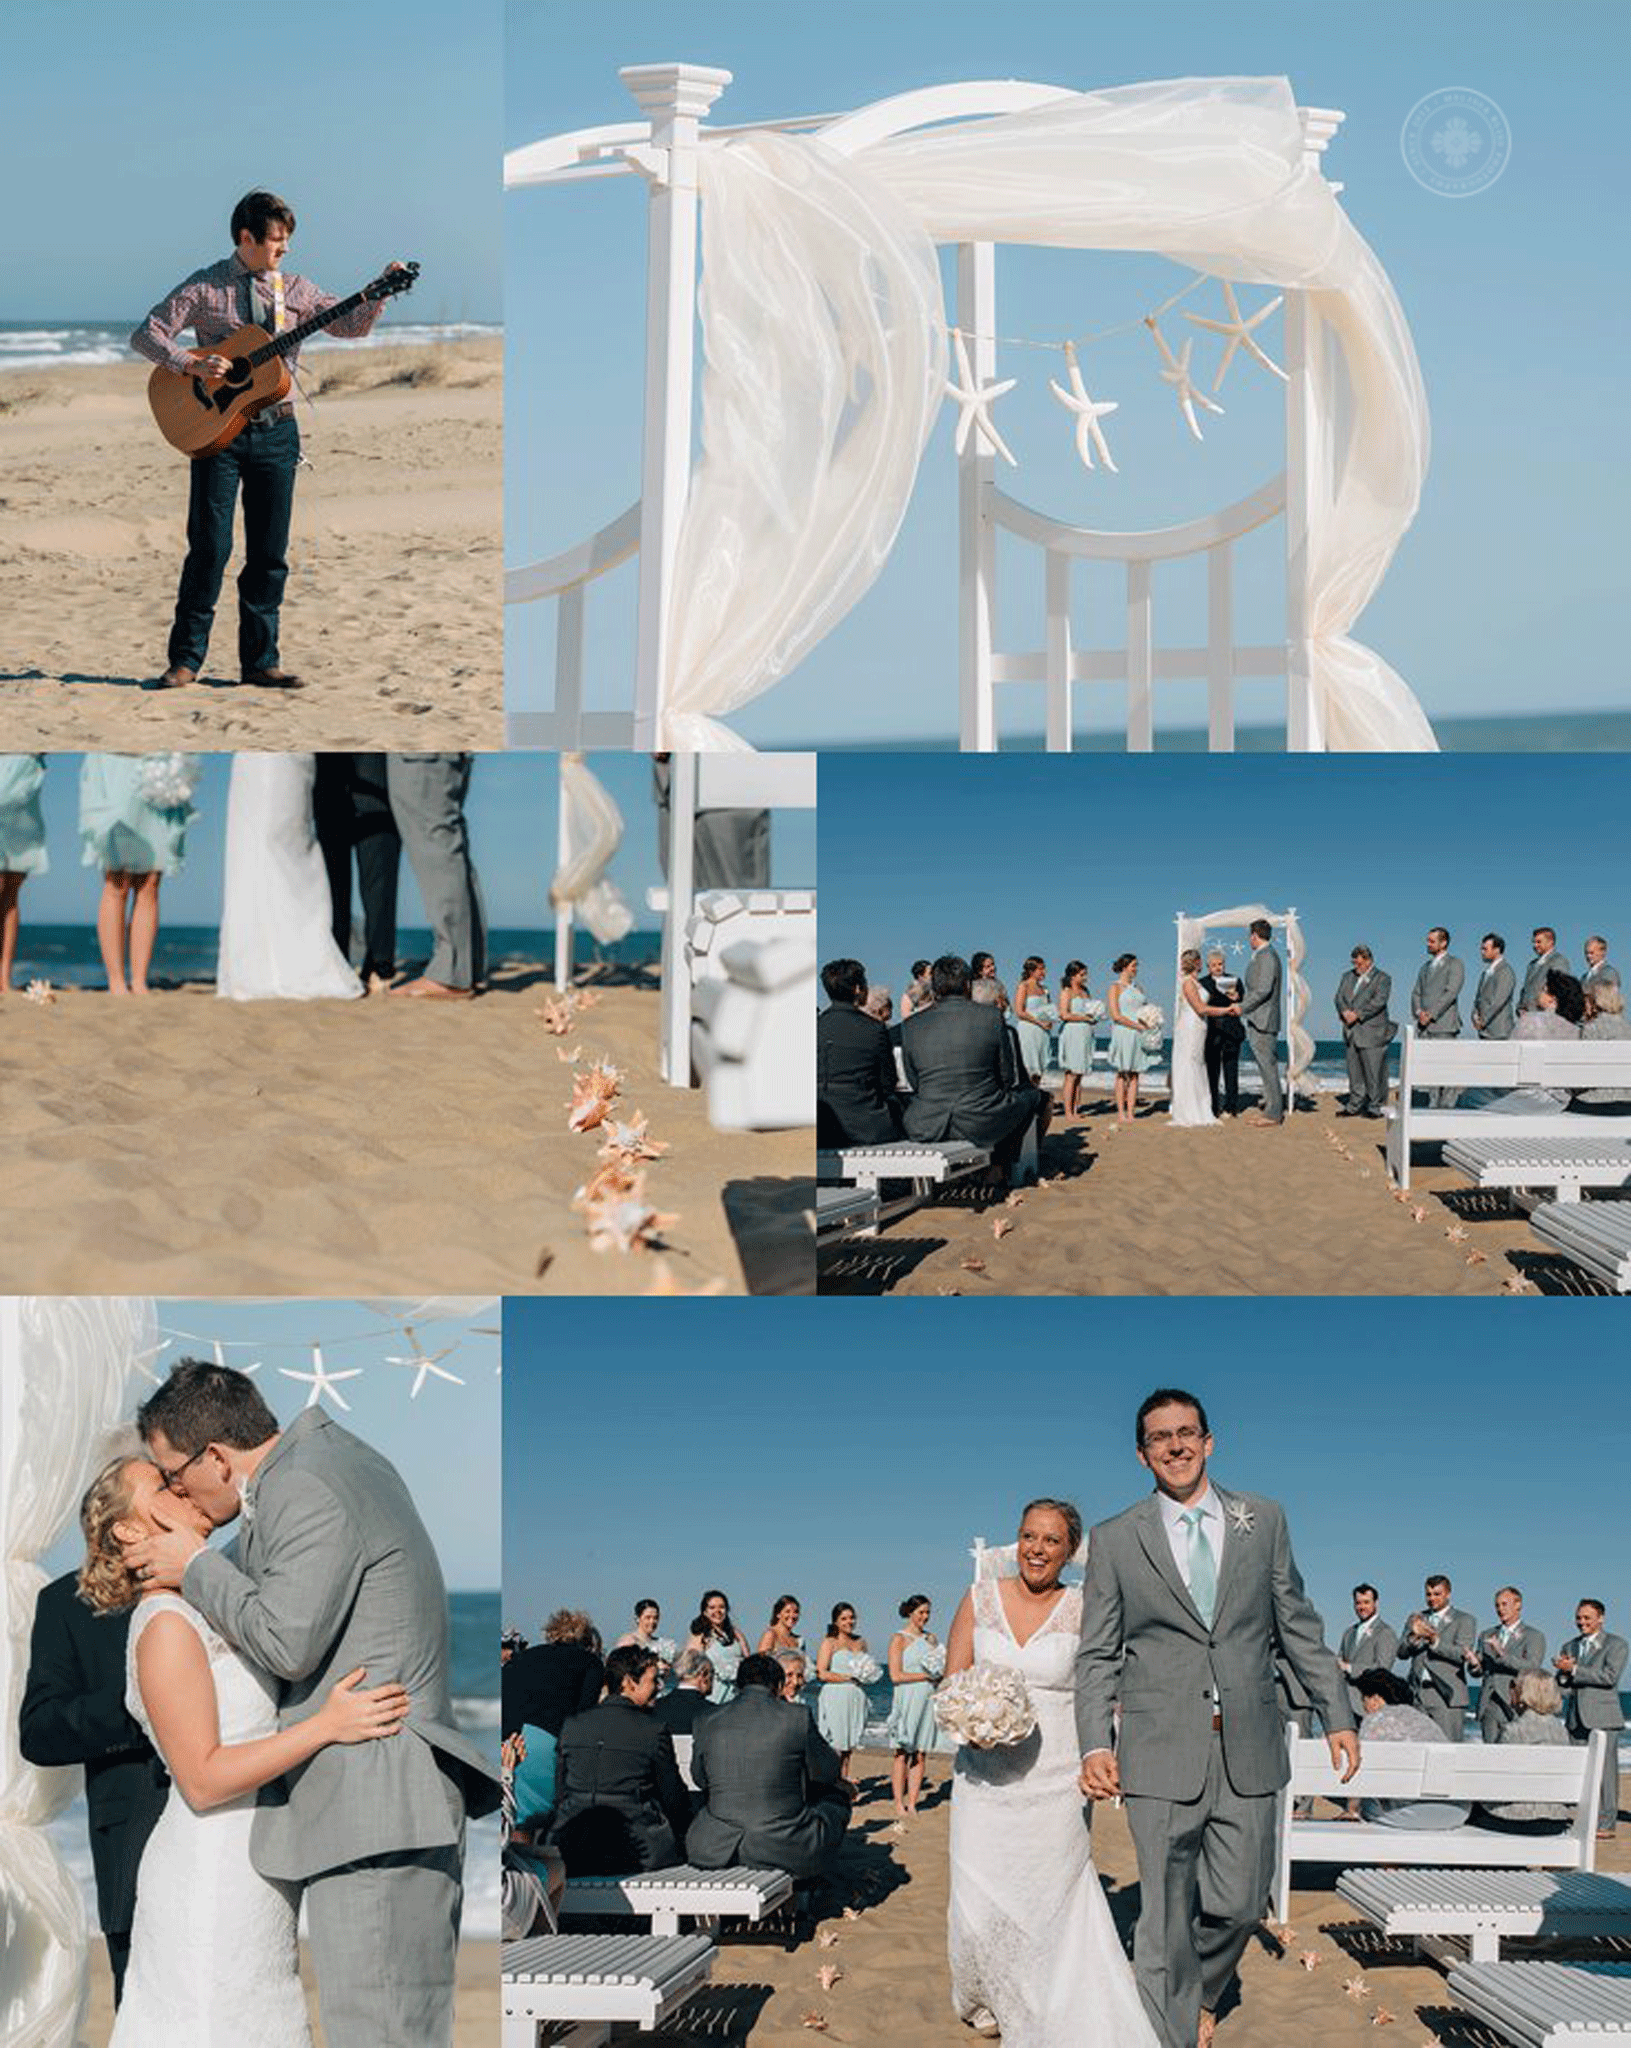 virginia-beach-wedding-photographers-melissa-bliss-photography-sandbridge-beach-wedding-day-photos-blue-white-beige-beach-wedding-inspiration-.png